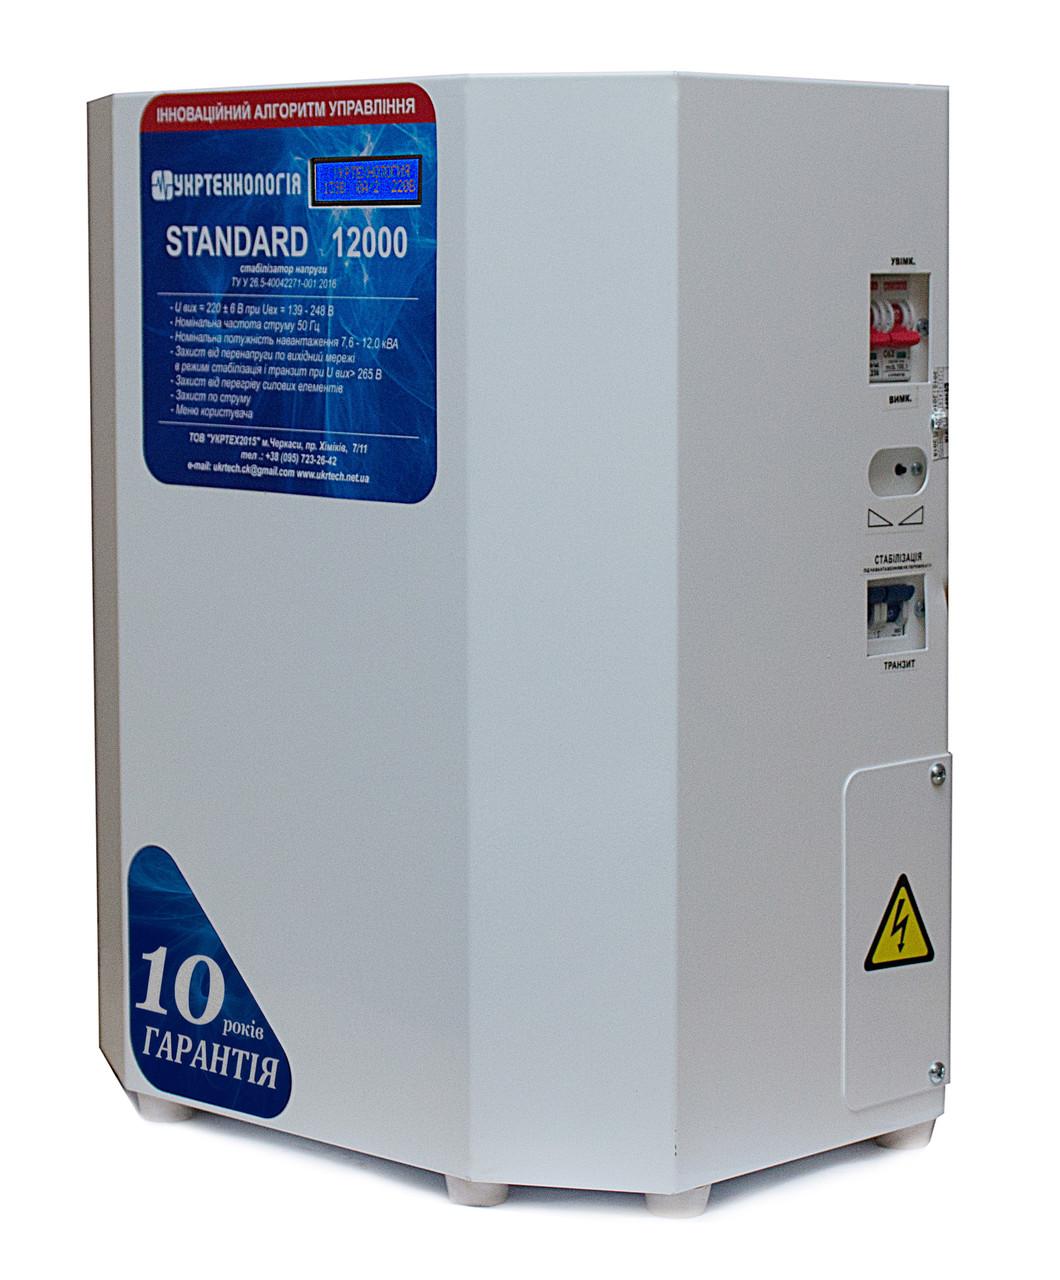 Укртехнология НСН-12000 Standard